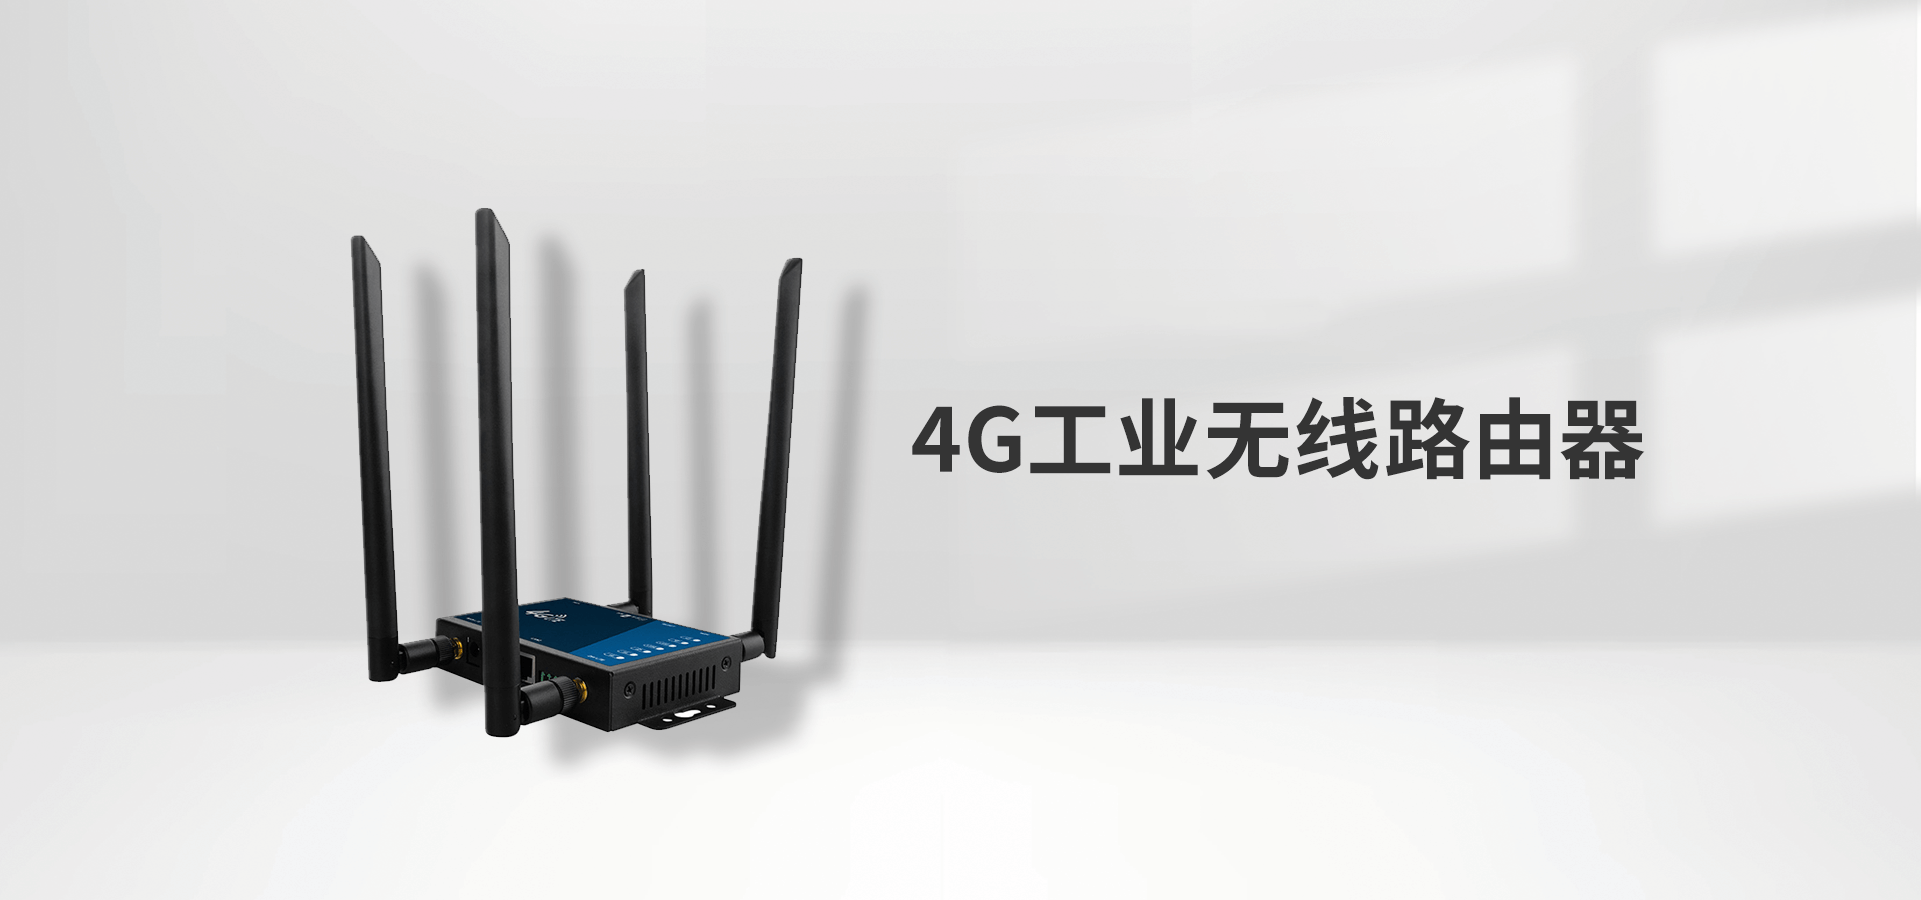 4G无线路由器